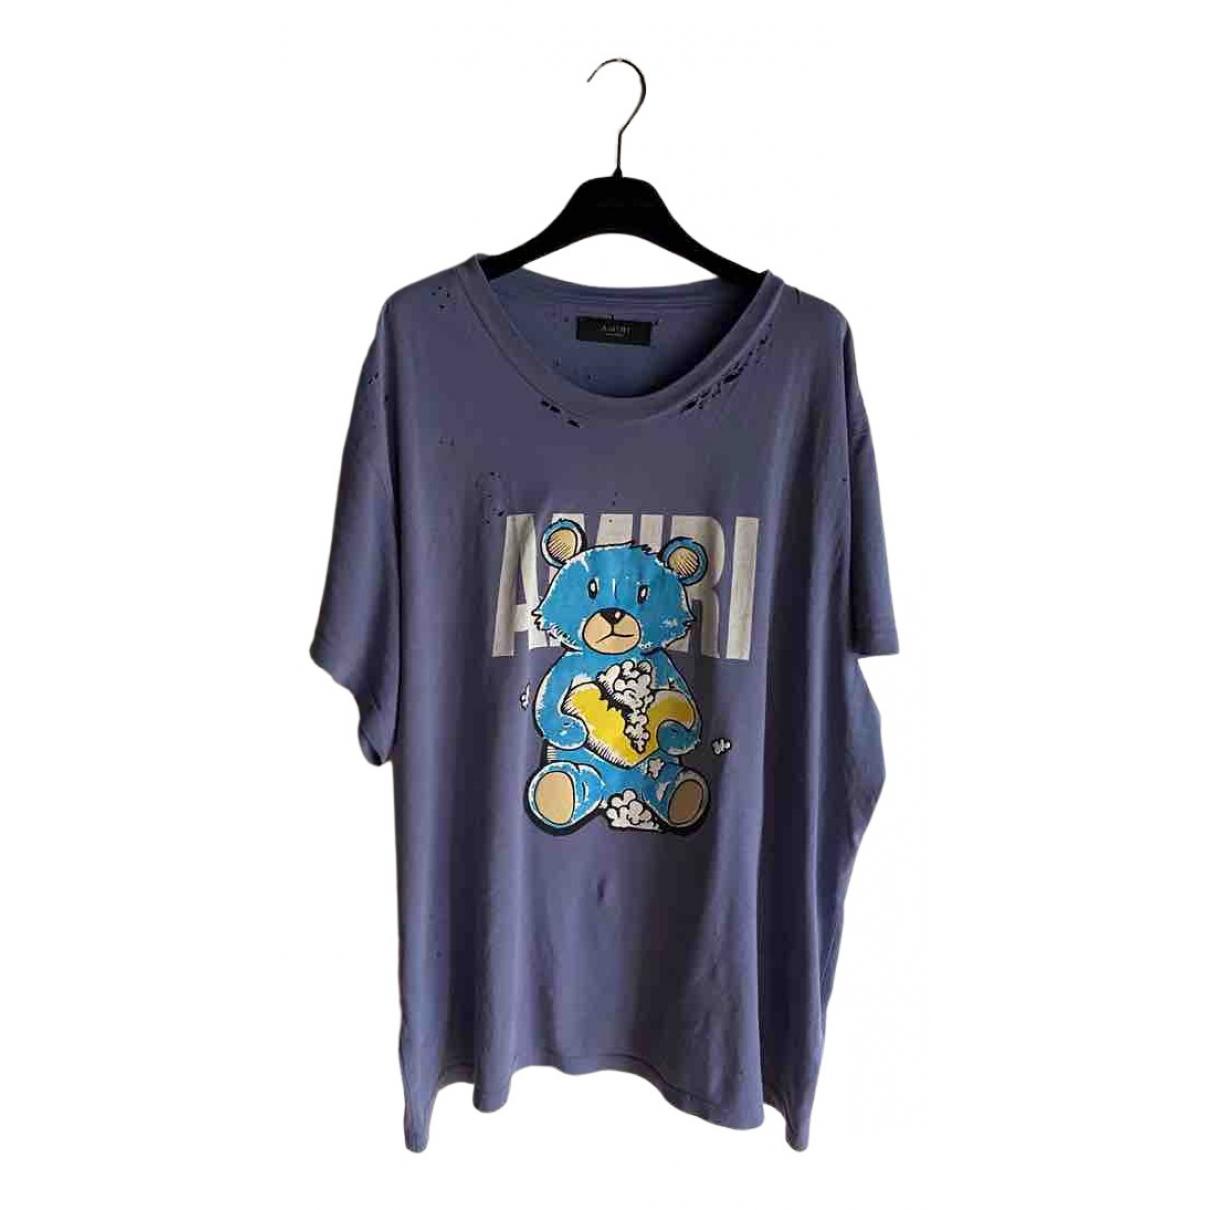 Amiri Purple Cotton T-shirt